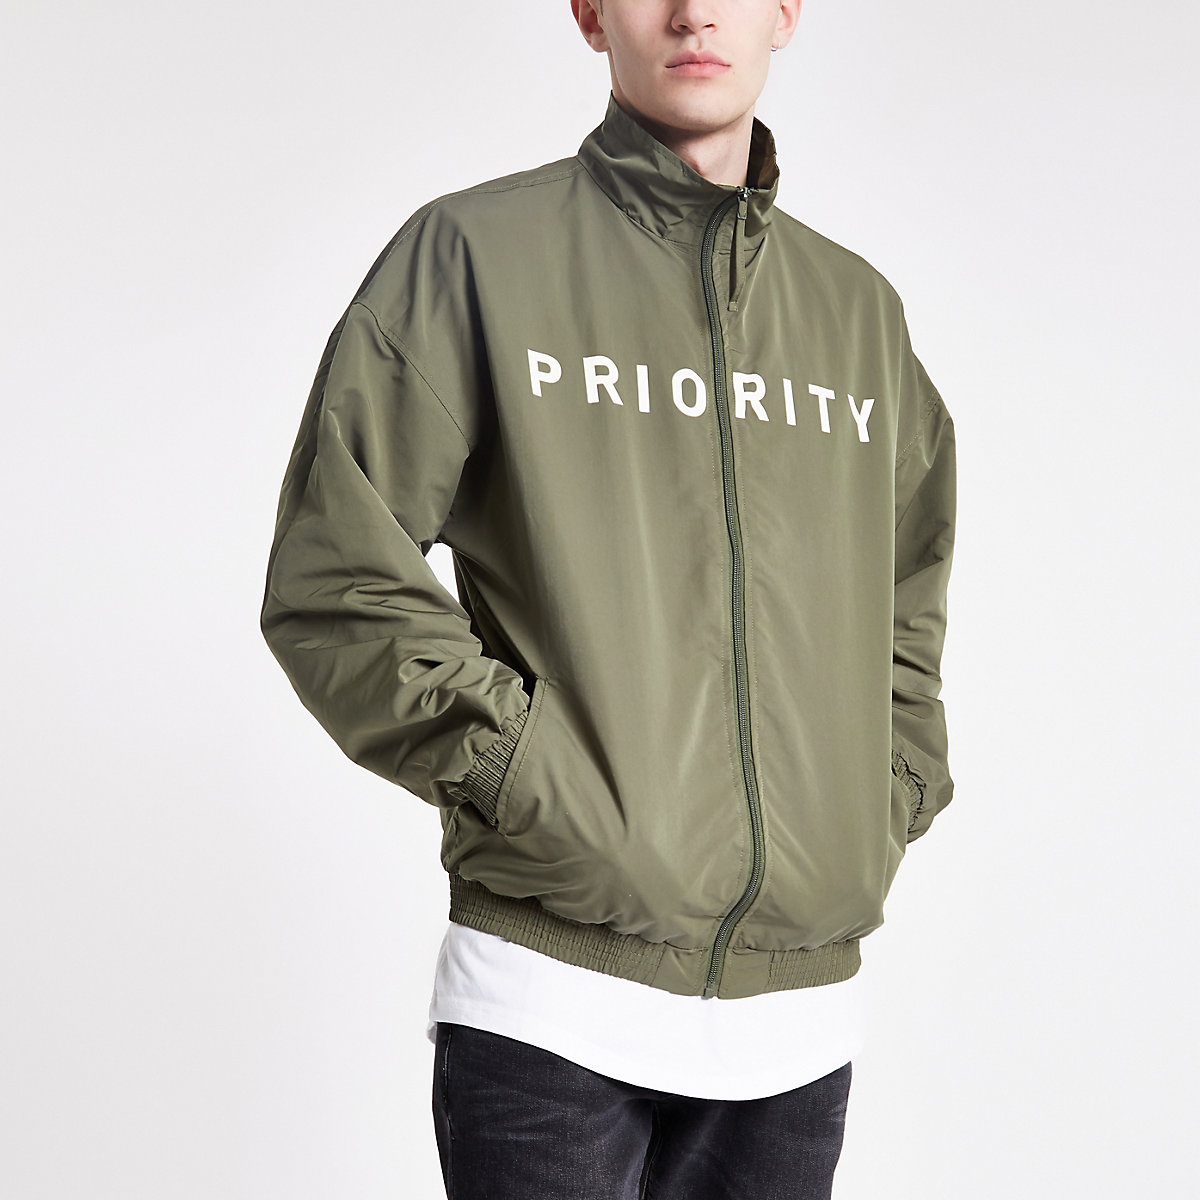 Minimum khaki 'Priority' slogan jacket